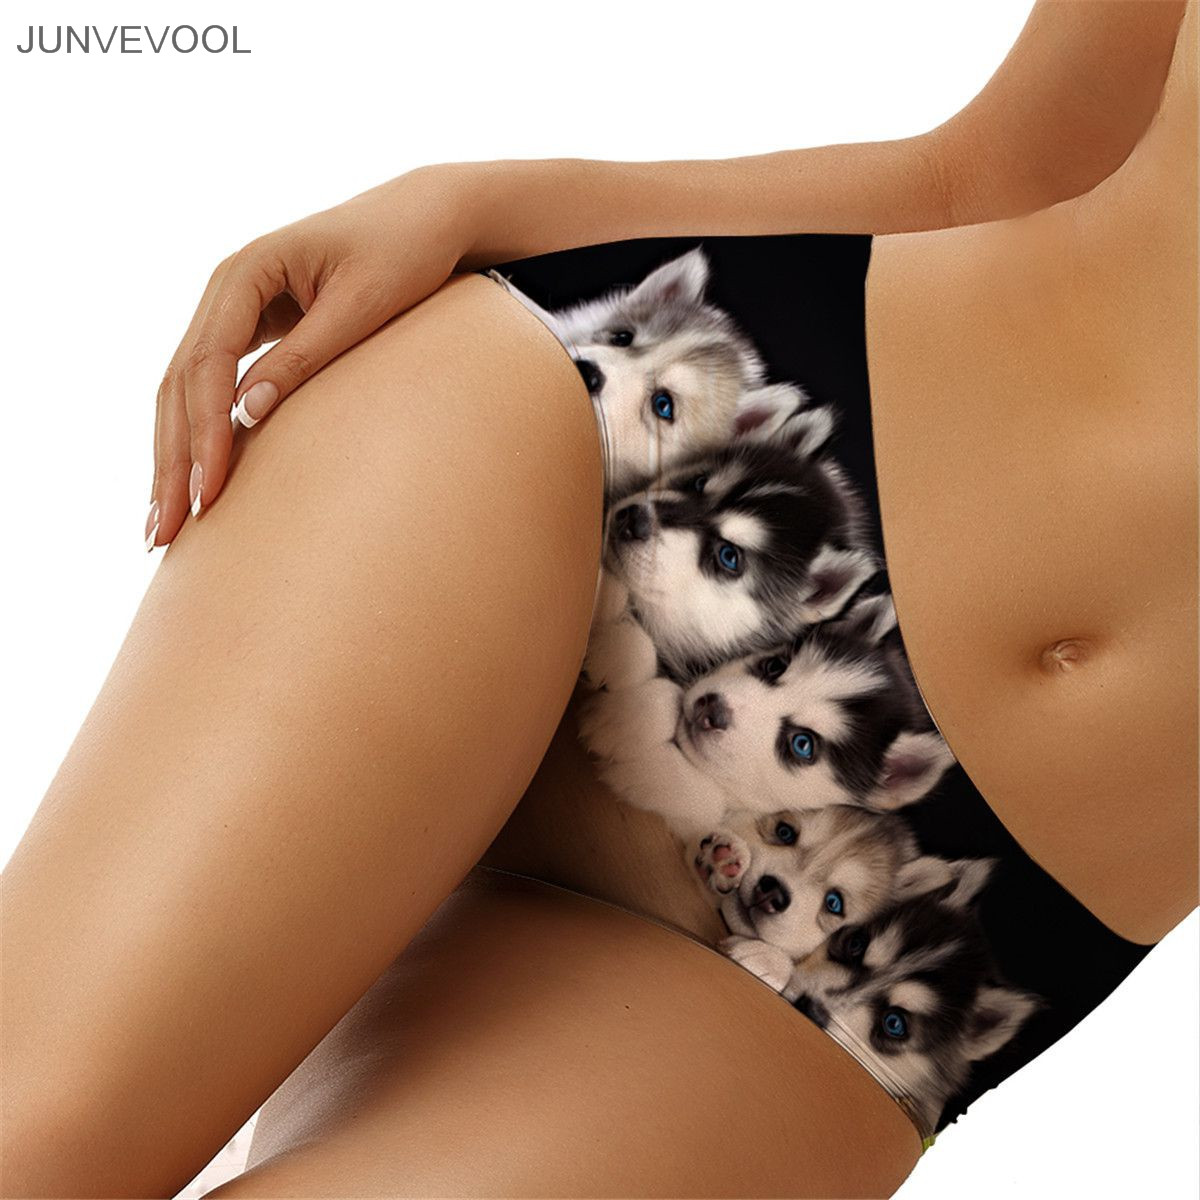 30539d5df بيع مثير النساء سراويل ملخصات الملابس الداخلية 3D الوشم قطعة واحدة السروال  المرأة السراويل 2017 الكلب طباعة كلسون سراويل الملابس الداخلية